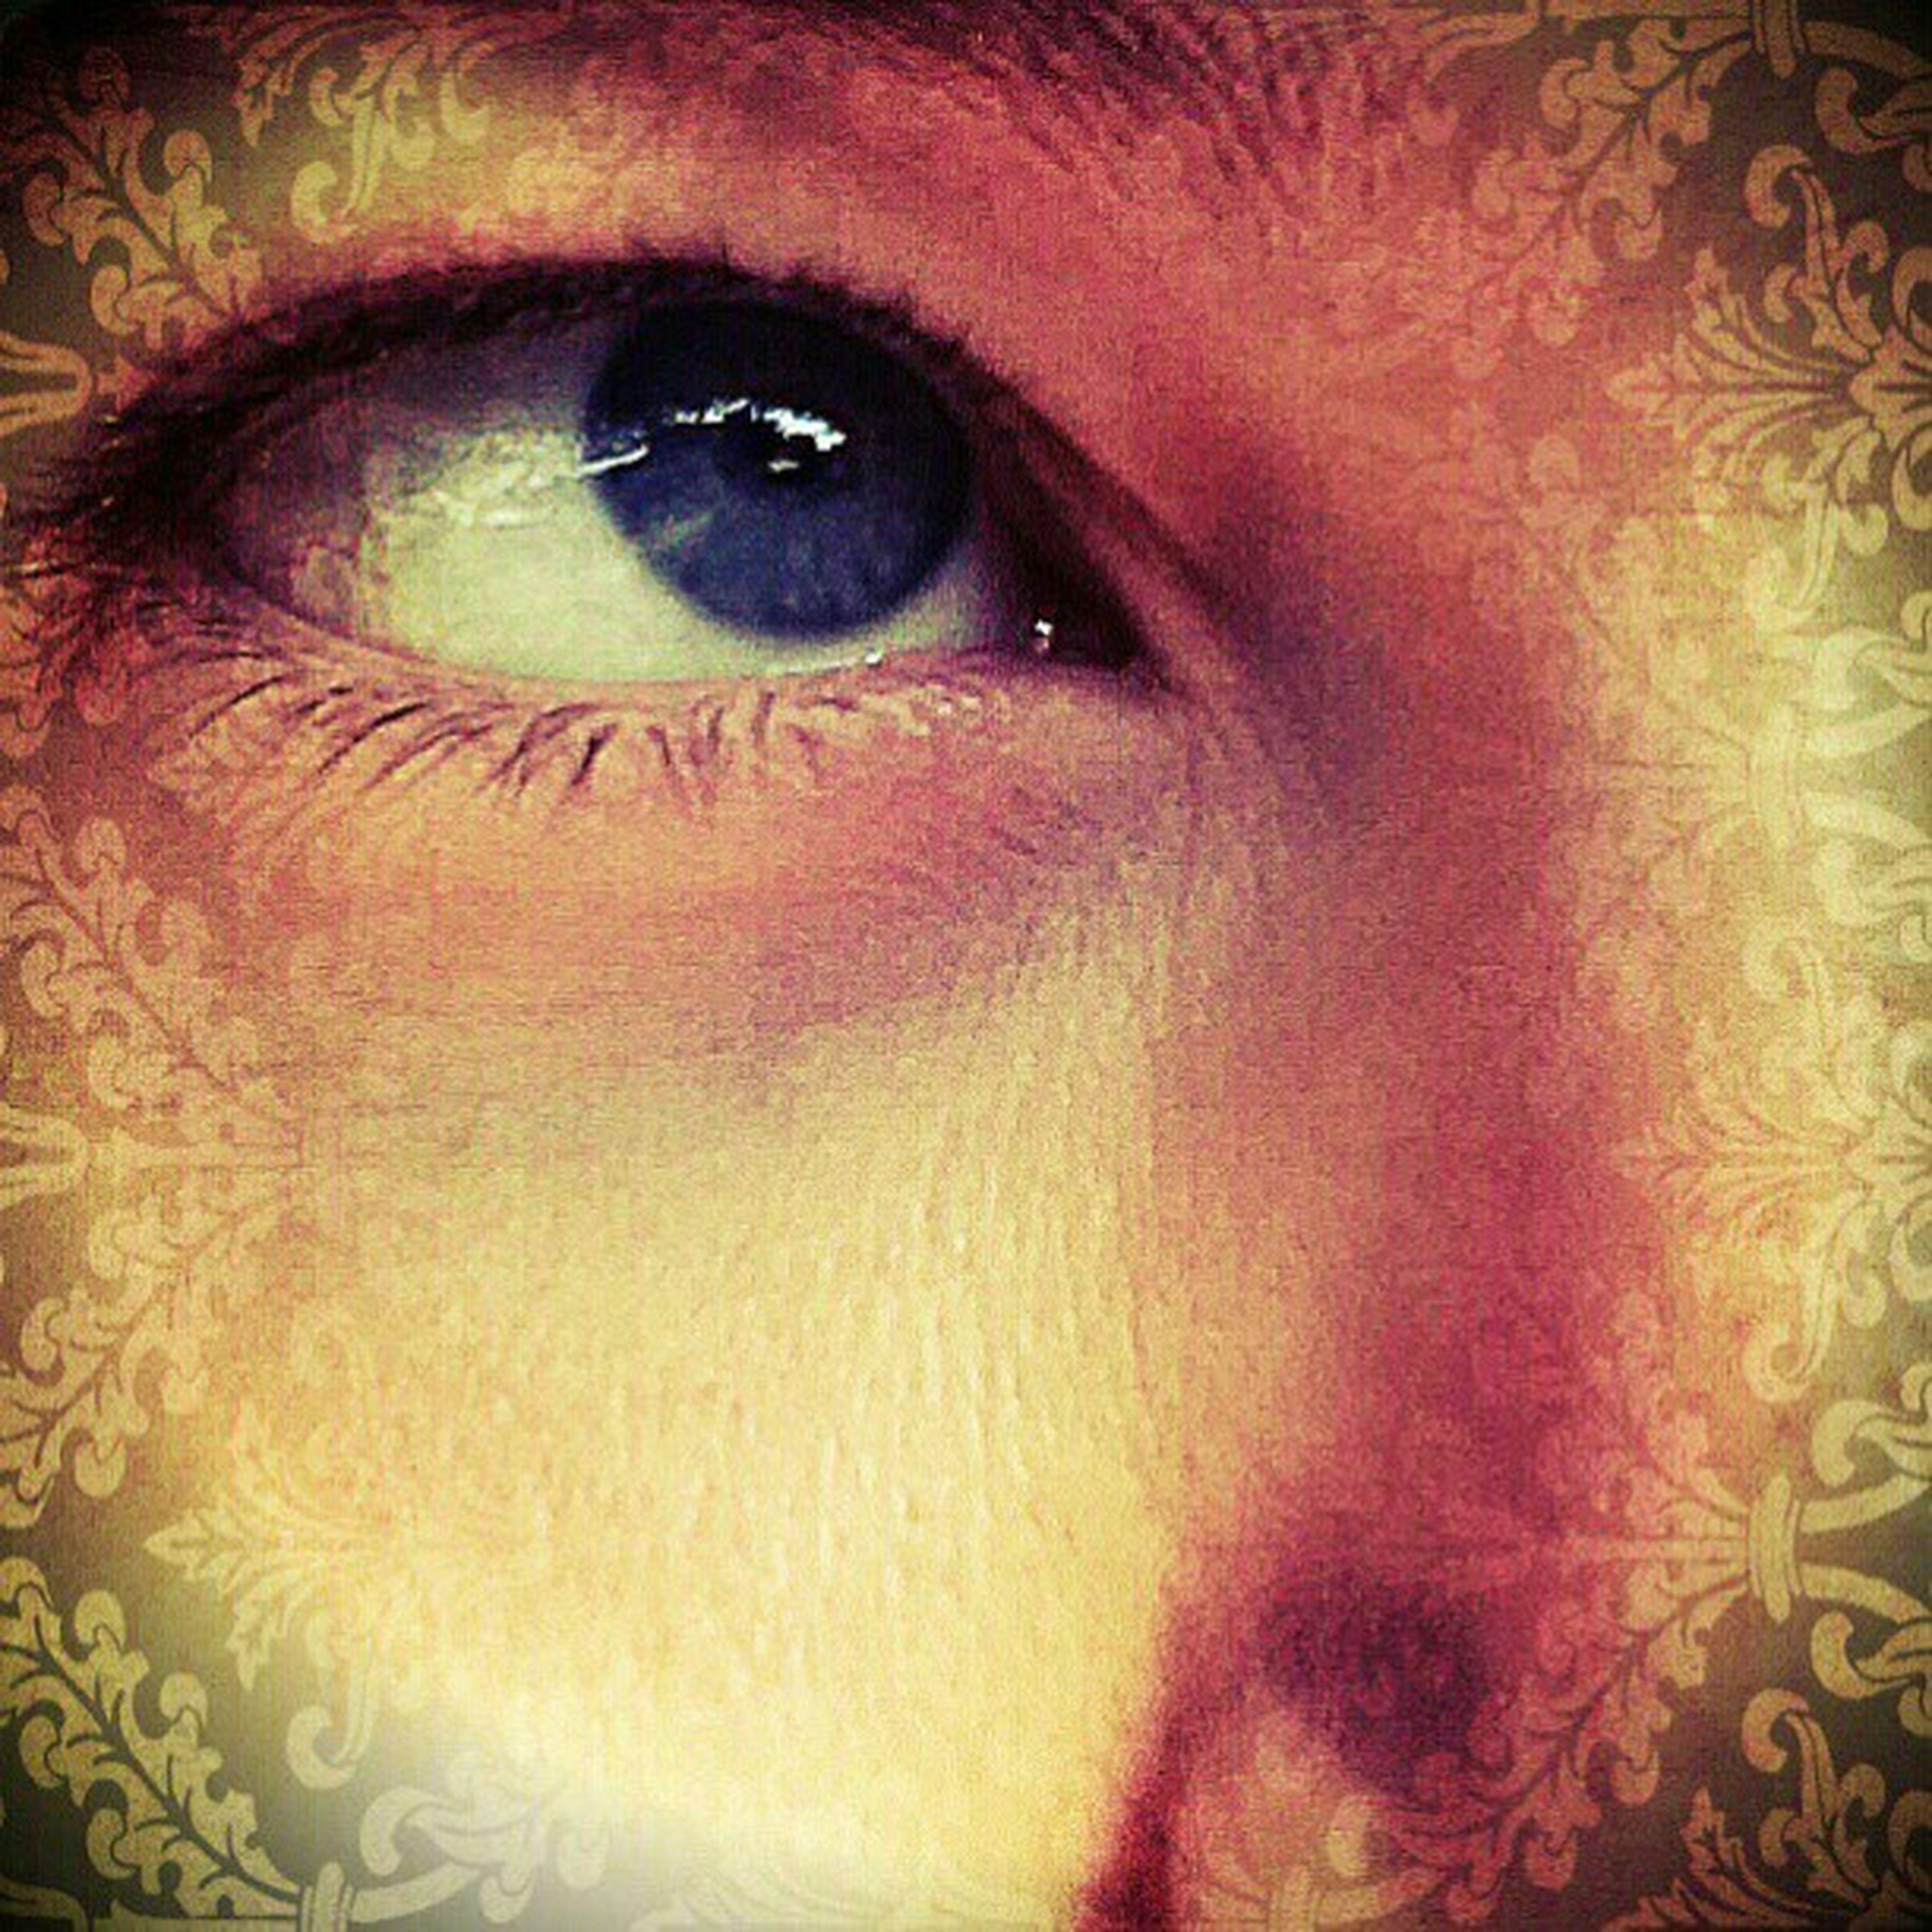 indoors, human eye, looking at camera, portrait, close-up, human face, headshot, young adult, lifestyles, front view, part of, person, human skin, eyelash, eyesight, leisure activity, make-up